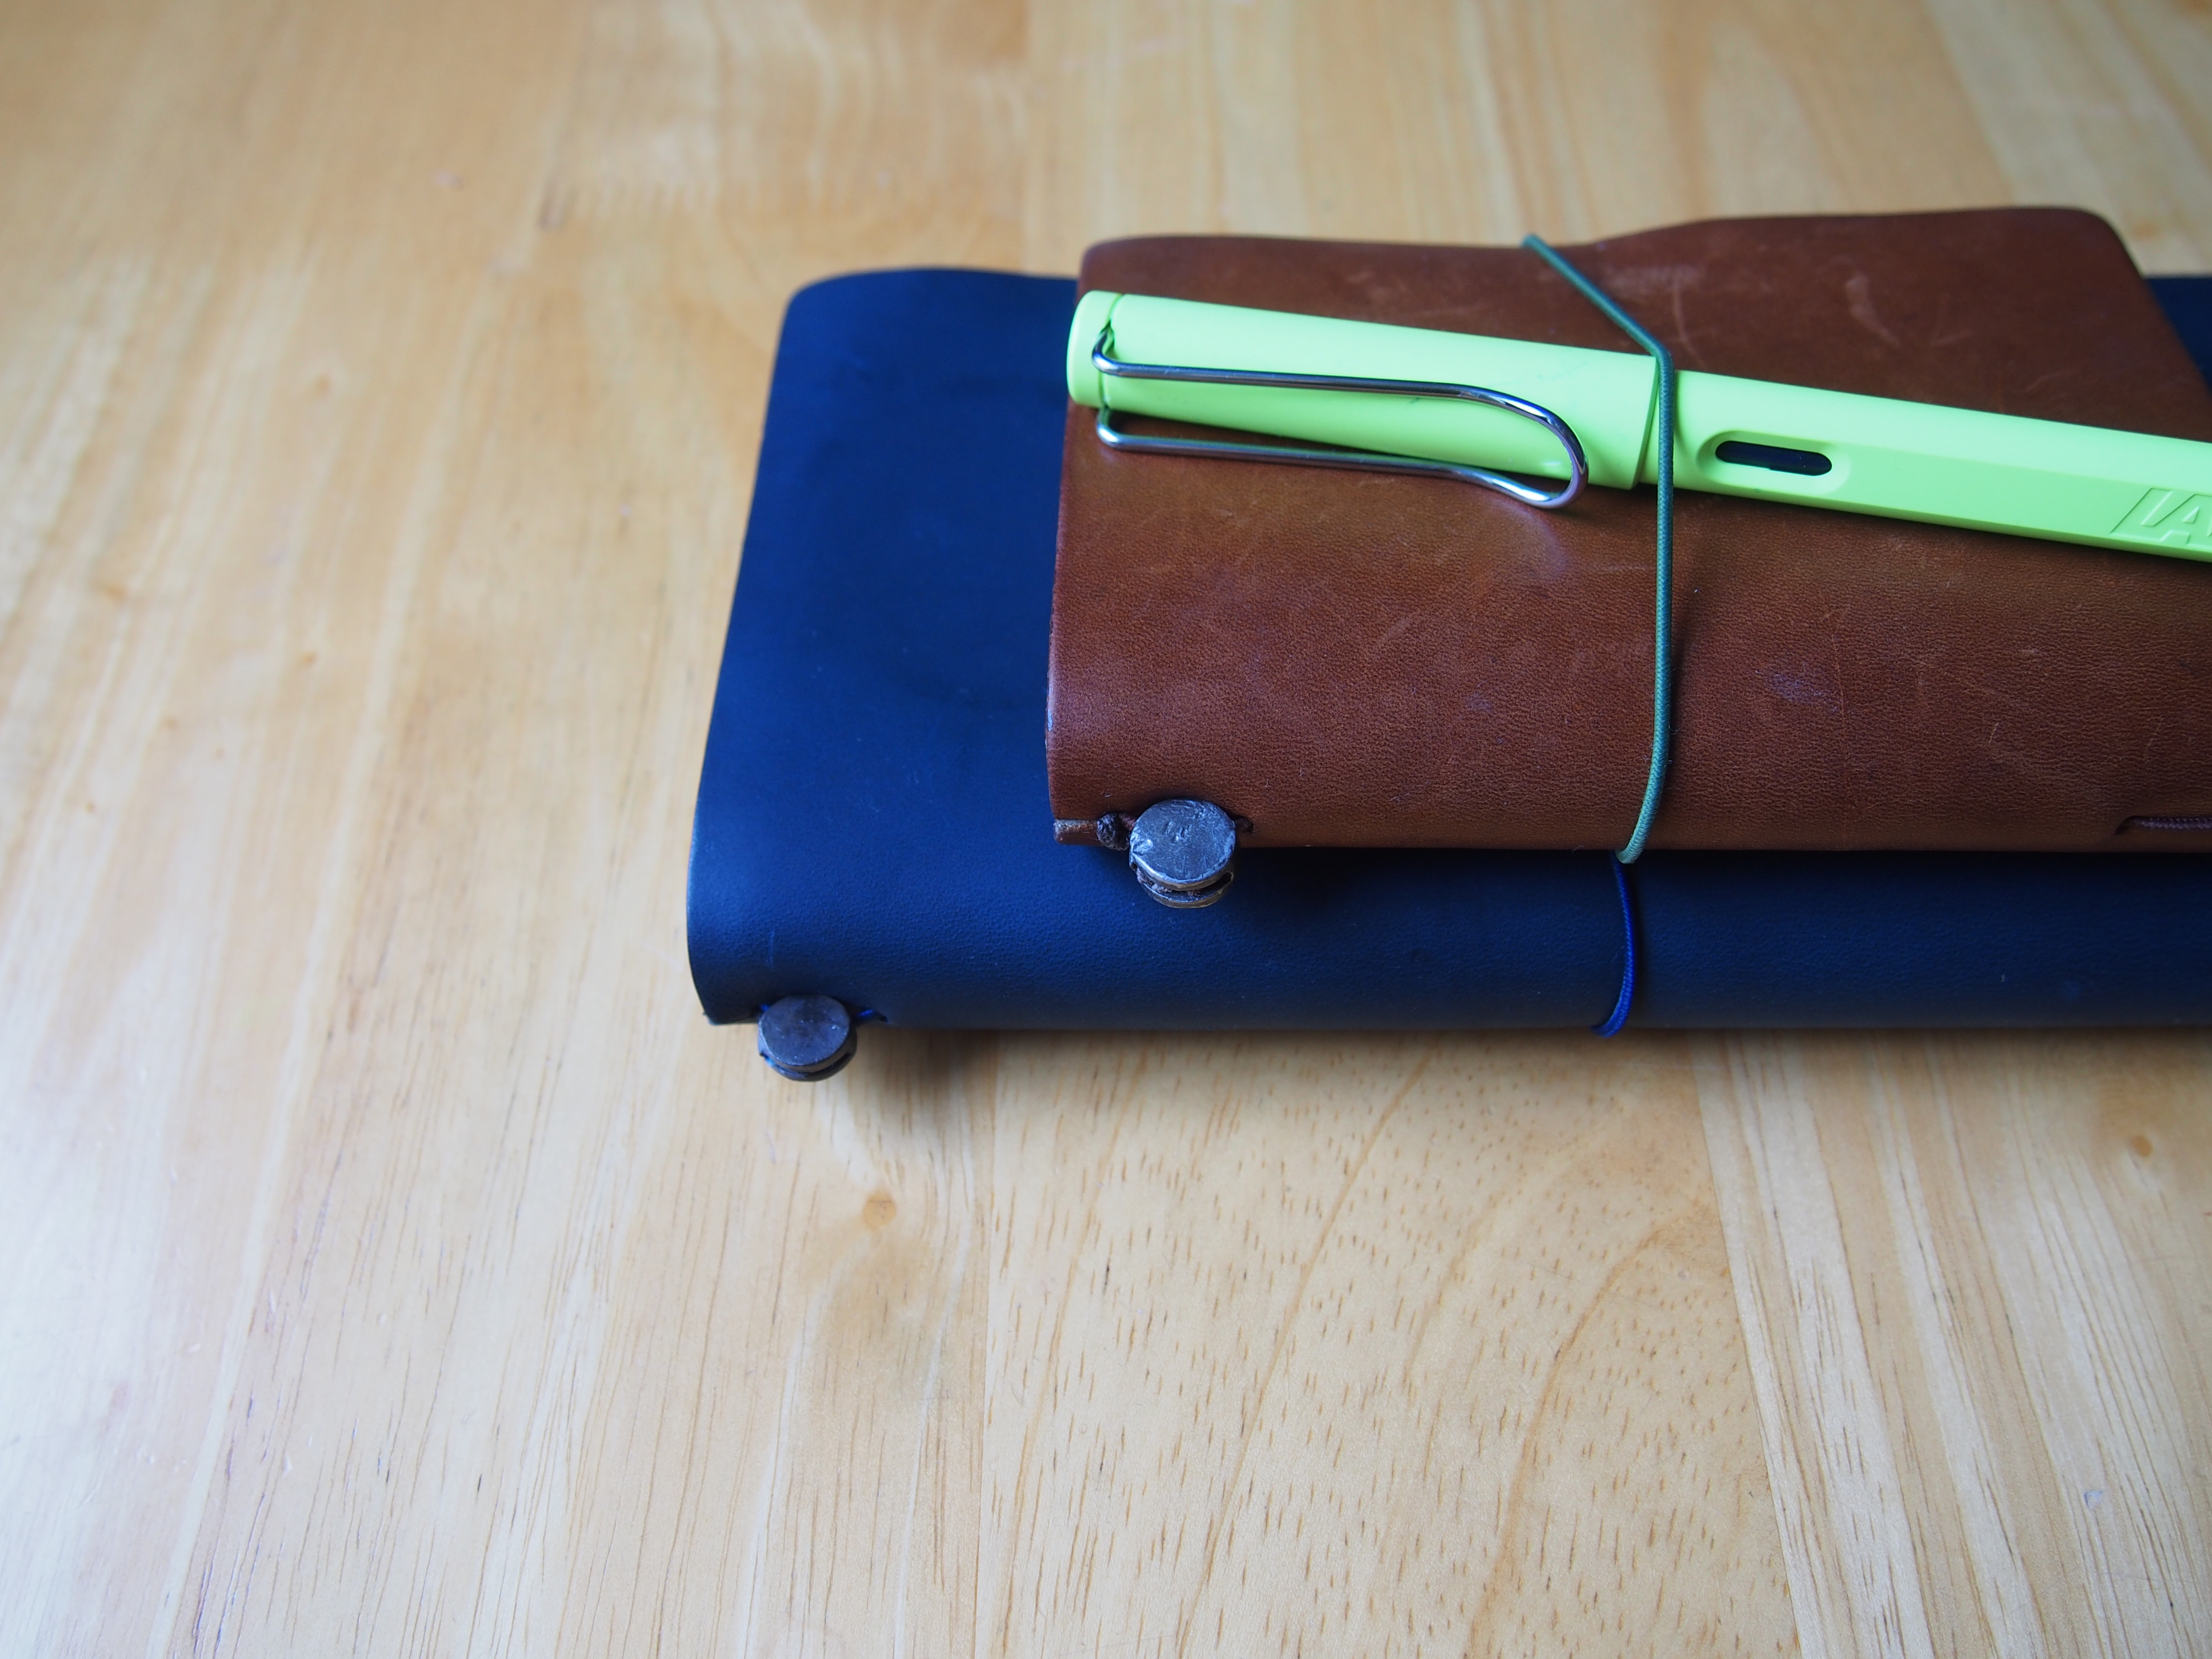 Midori Traveler's Notebook Set Up Regular Size Blue Edition Toronto Canada Wonderpens.ca Wonder Pens Blog